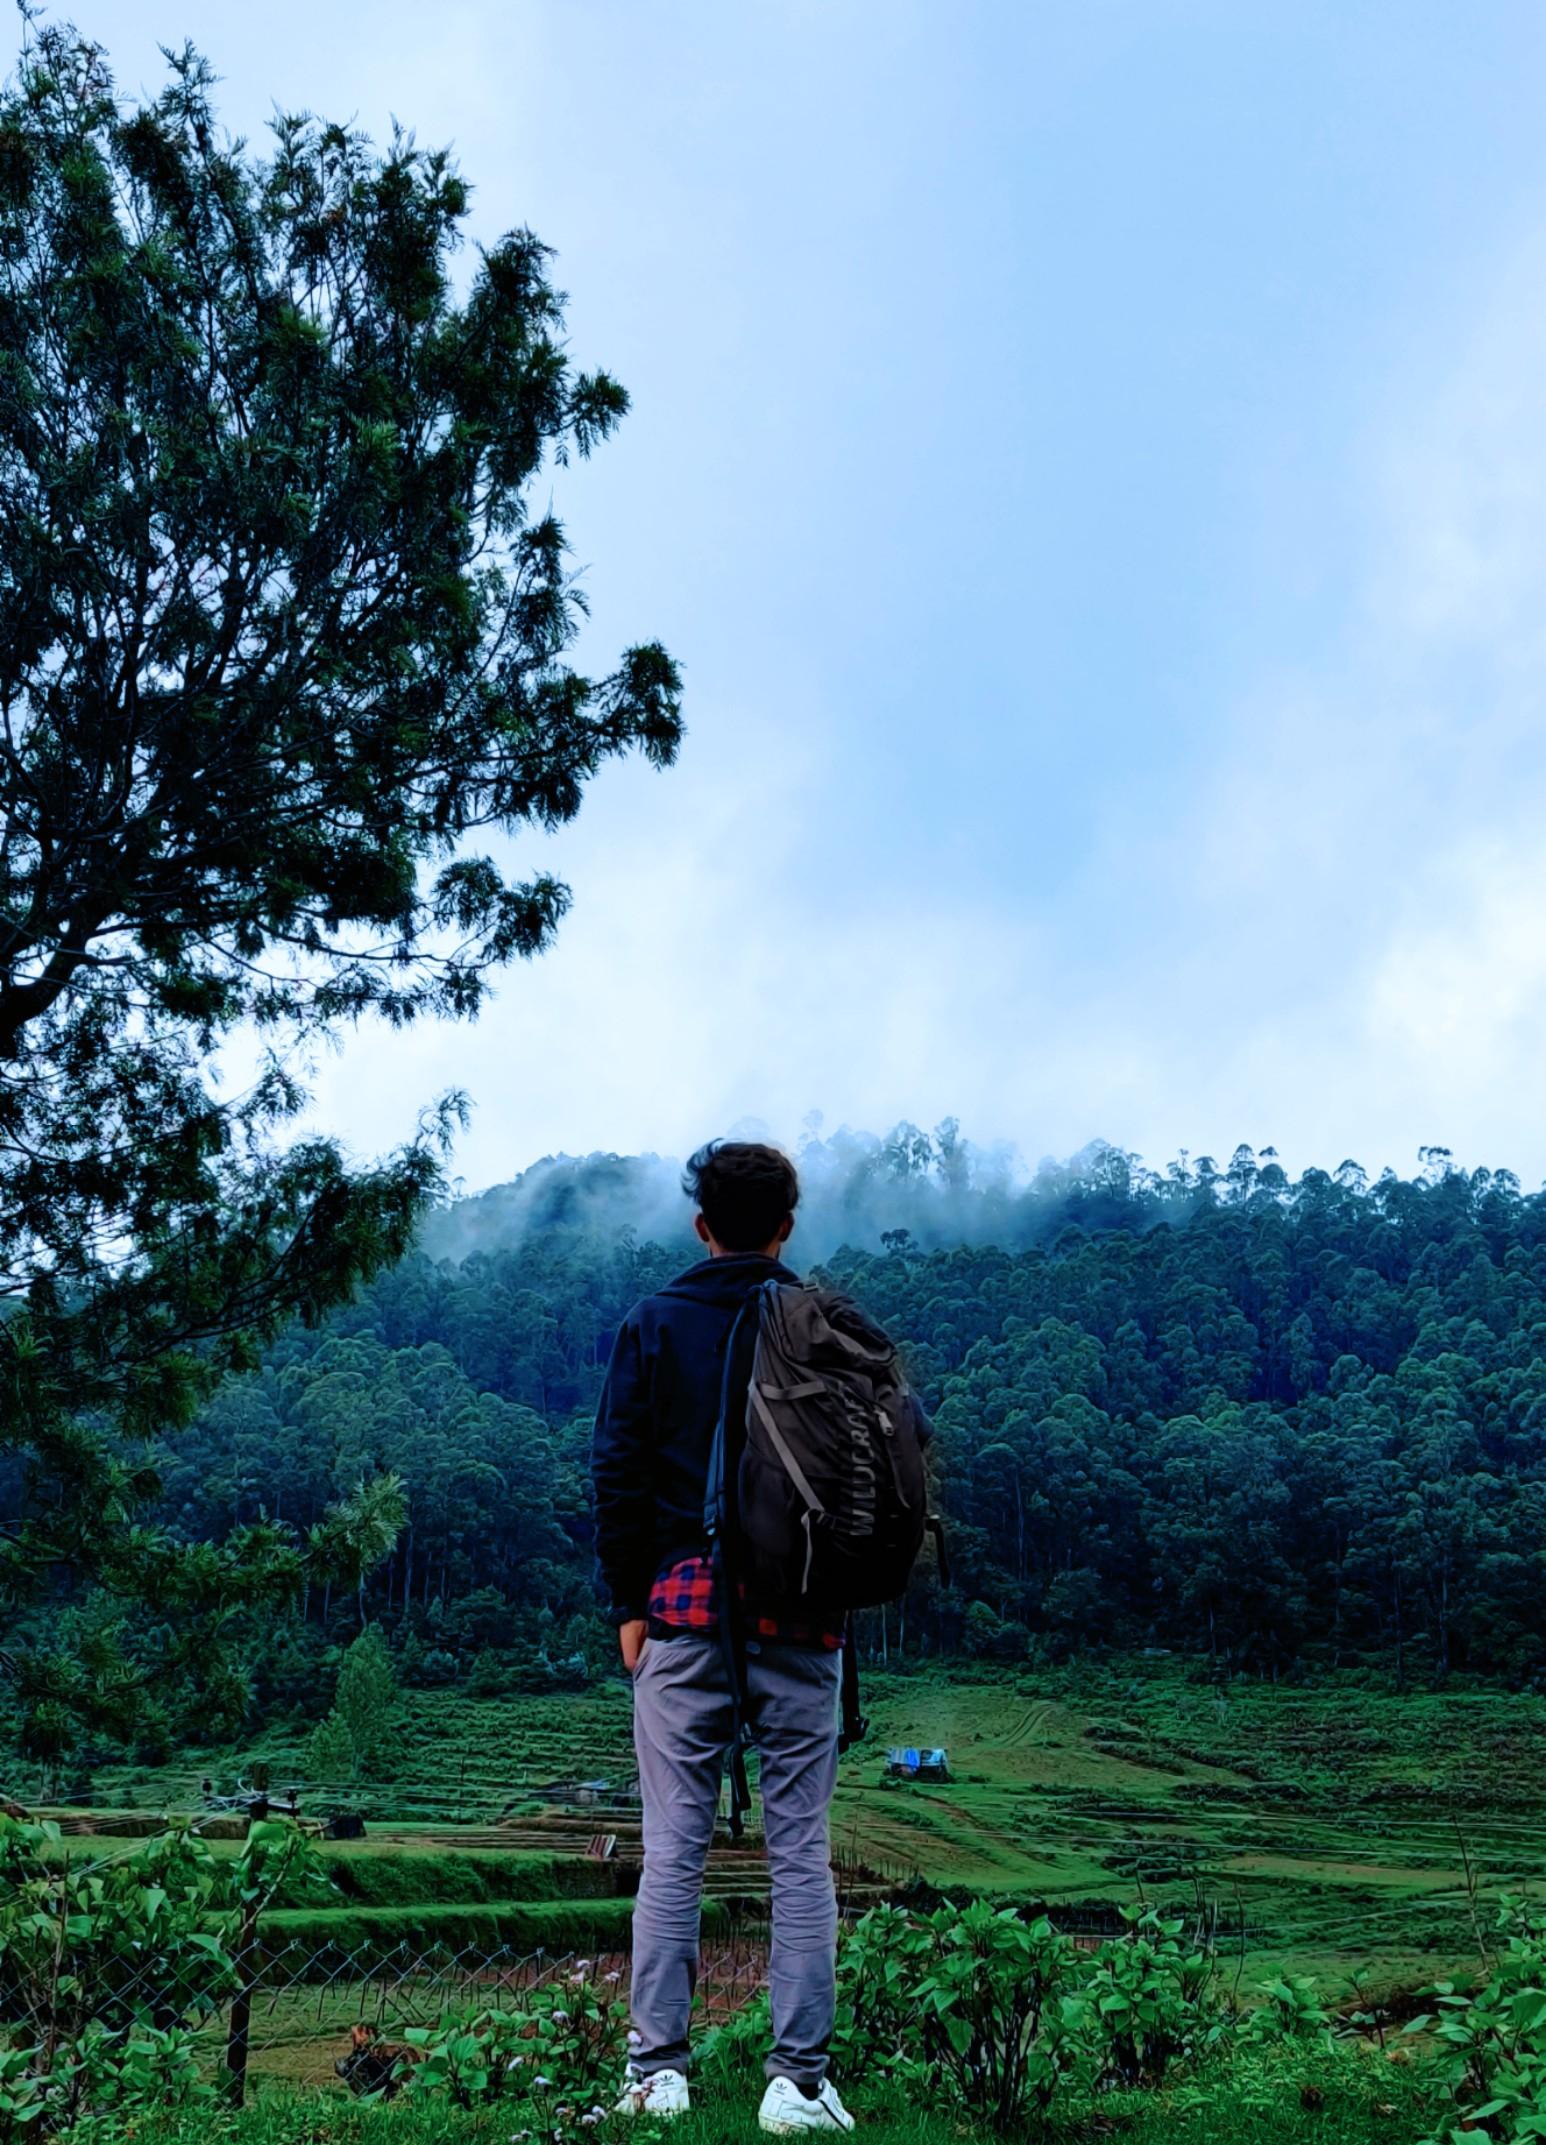 traveler admiring nature